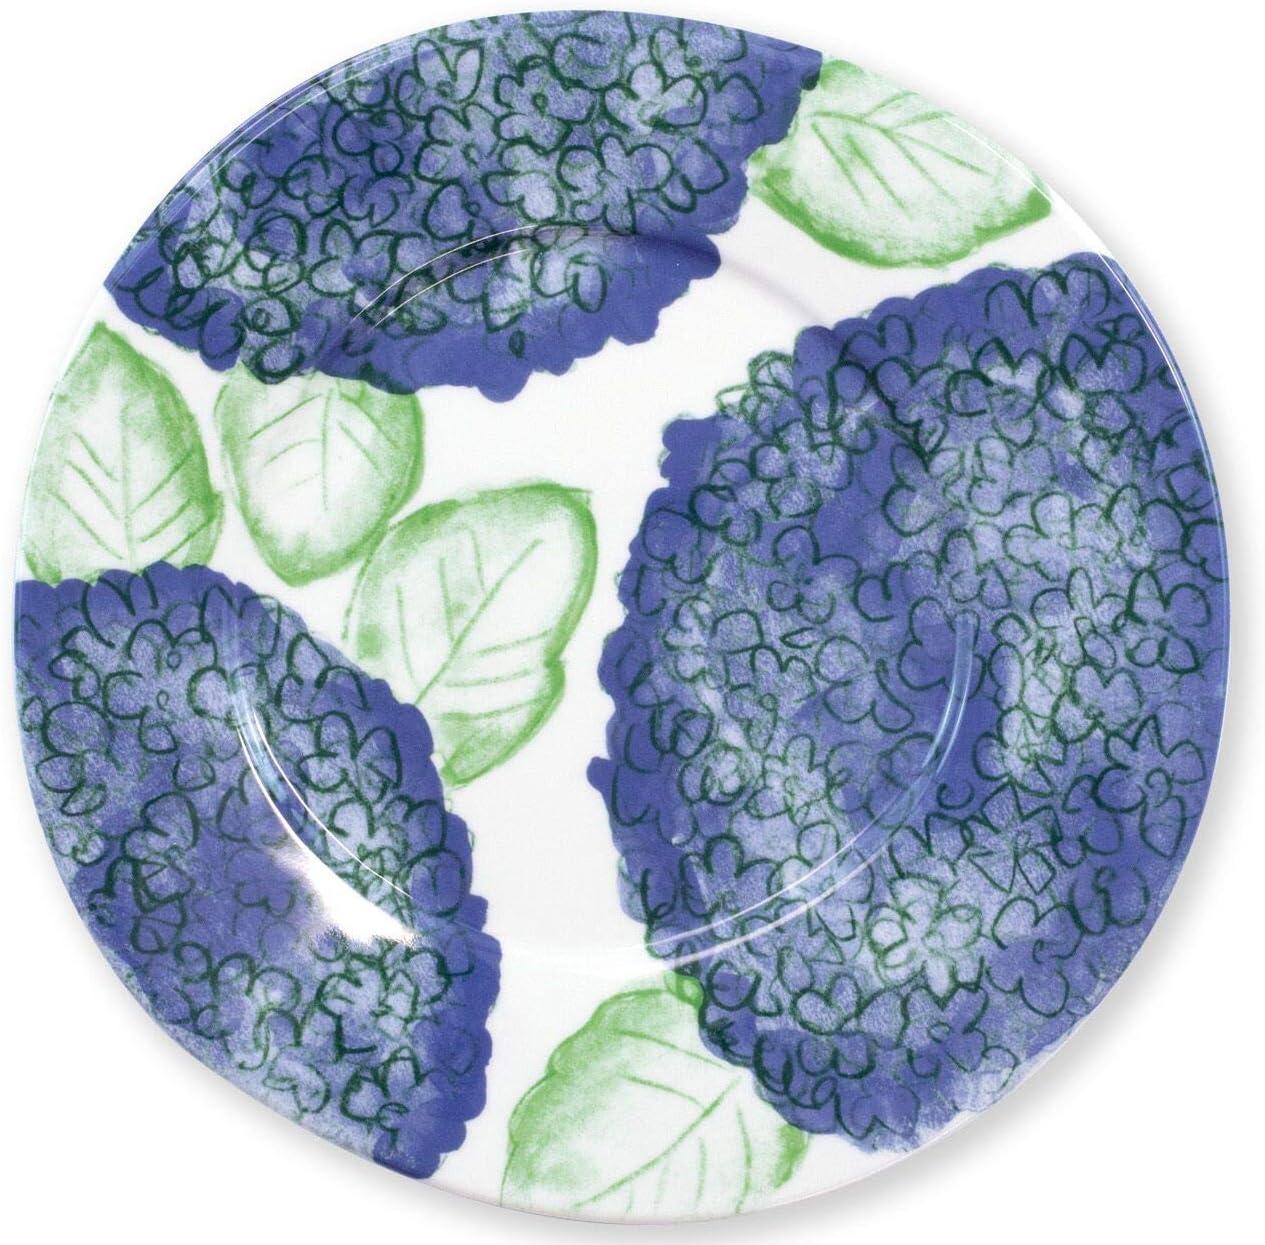 Vietri Melamine Hydrangea Dinner Plate - Premium Italian Tableware